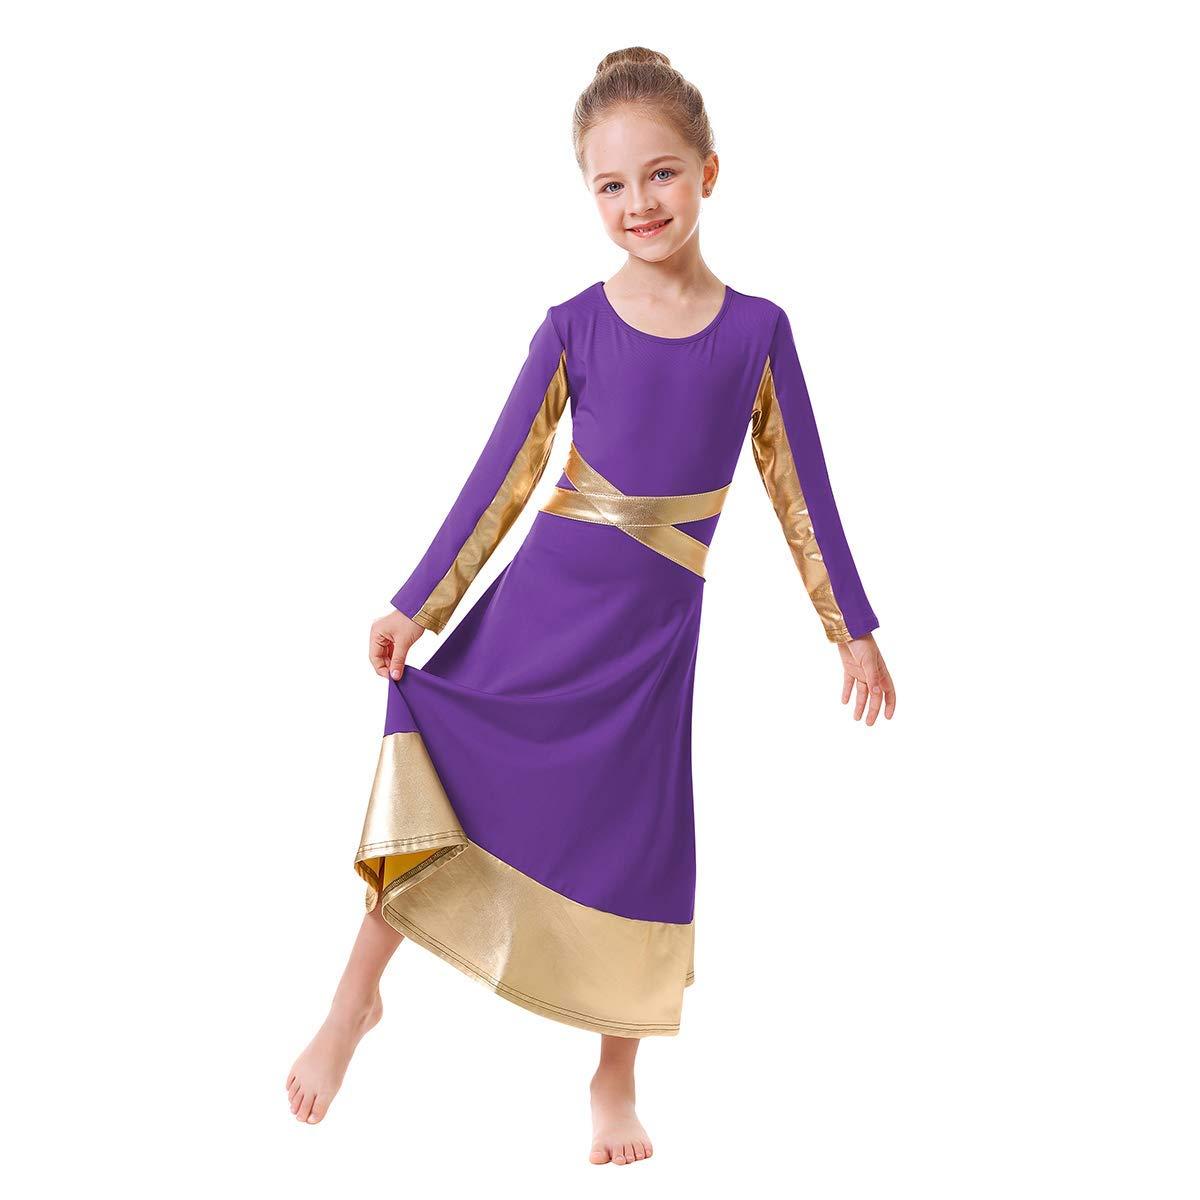 Kids Metallic Gold Cross Praise Dance Dress for Girls Liturgical Loose Fit Full Length Tunic Dancewear Worship Long Costume